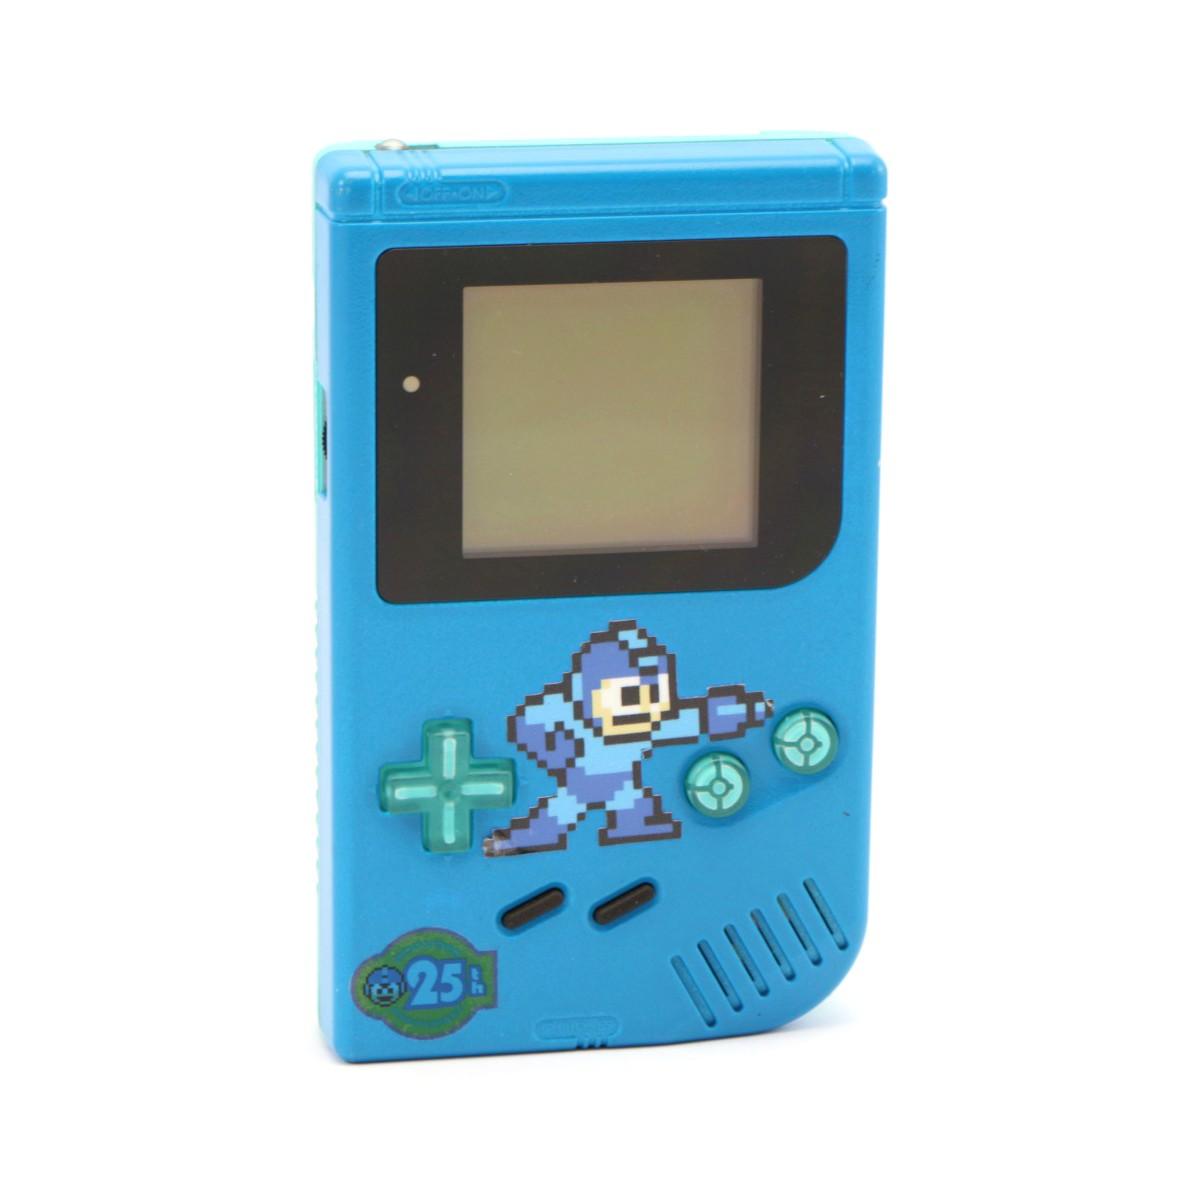 Konsole Classic DMG-01 #Mega Man Custom Case + Backlight #blau